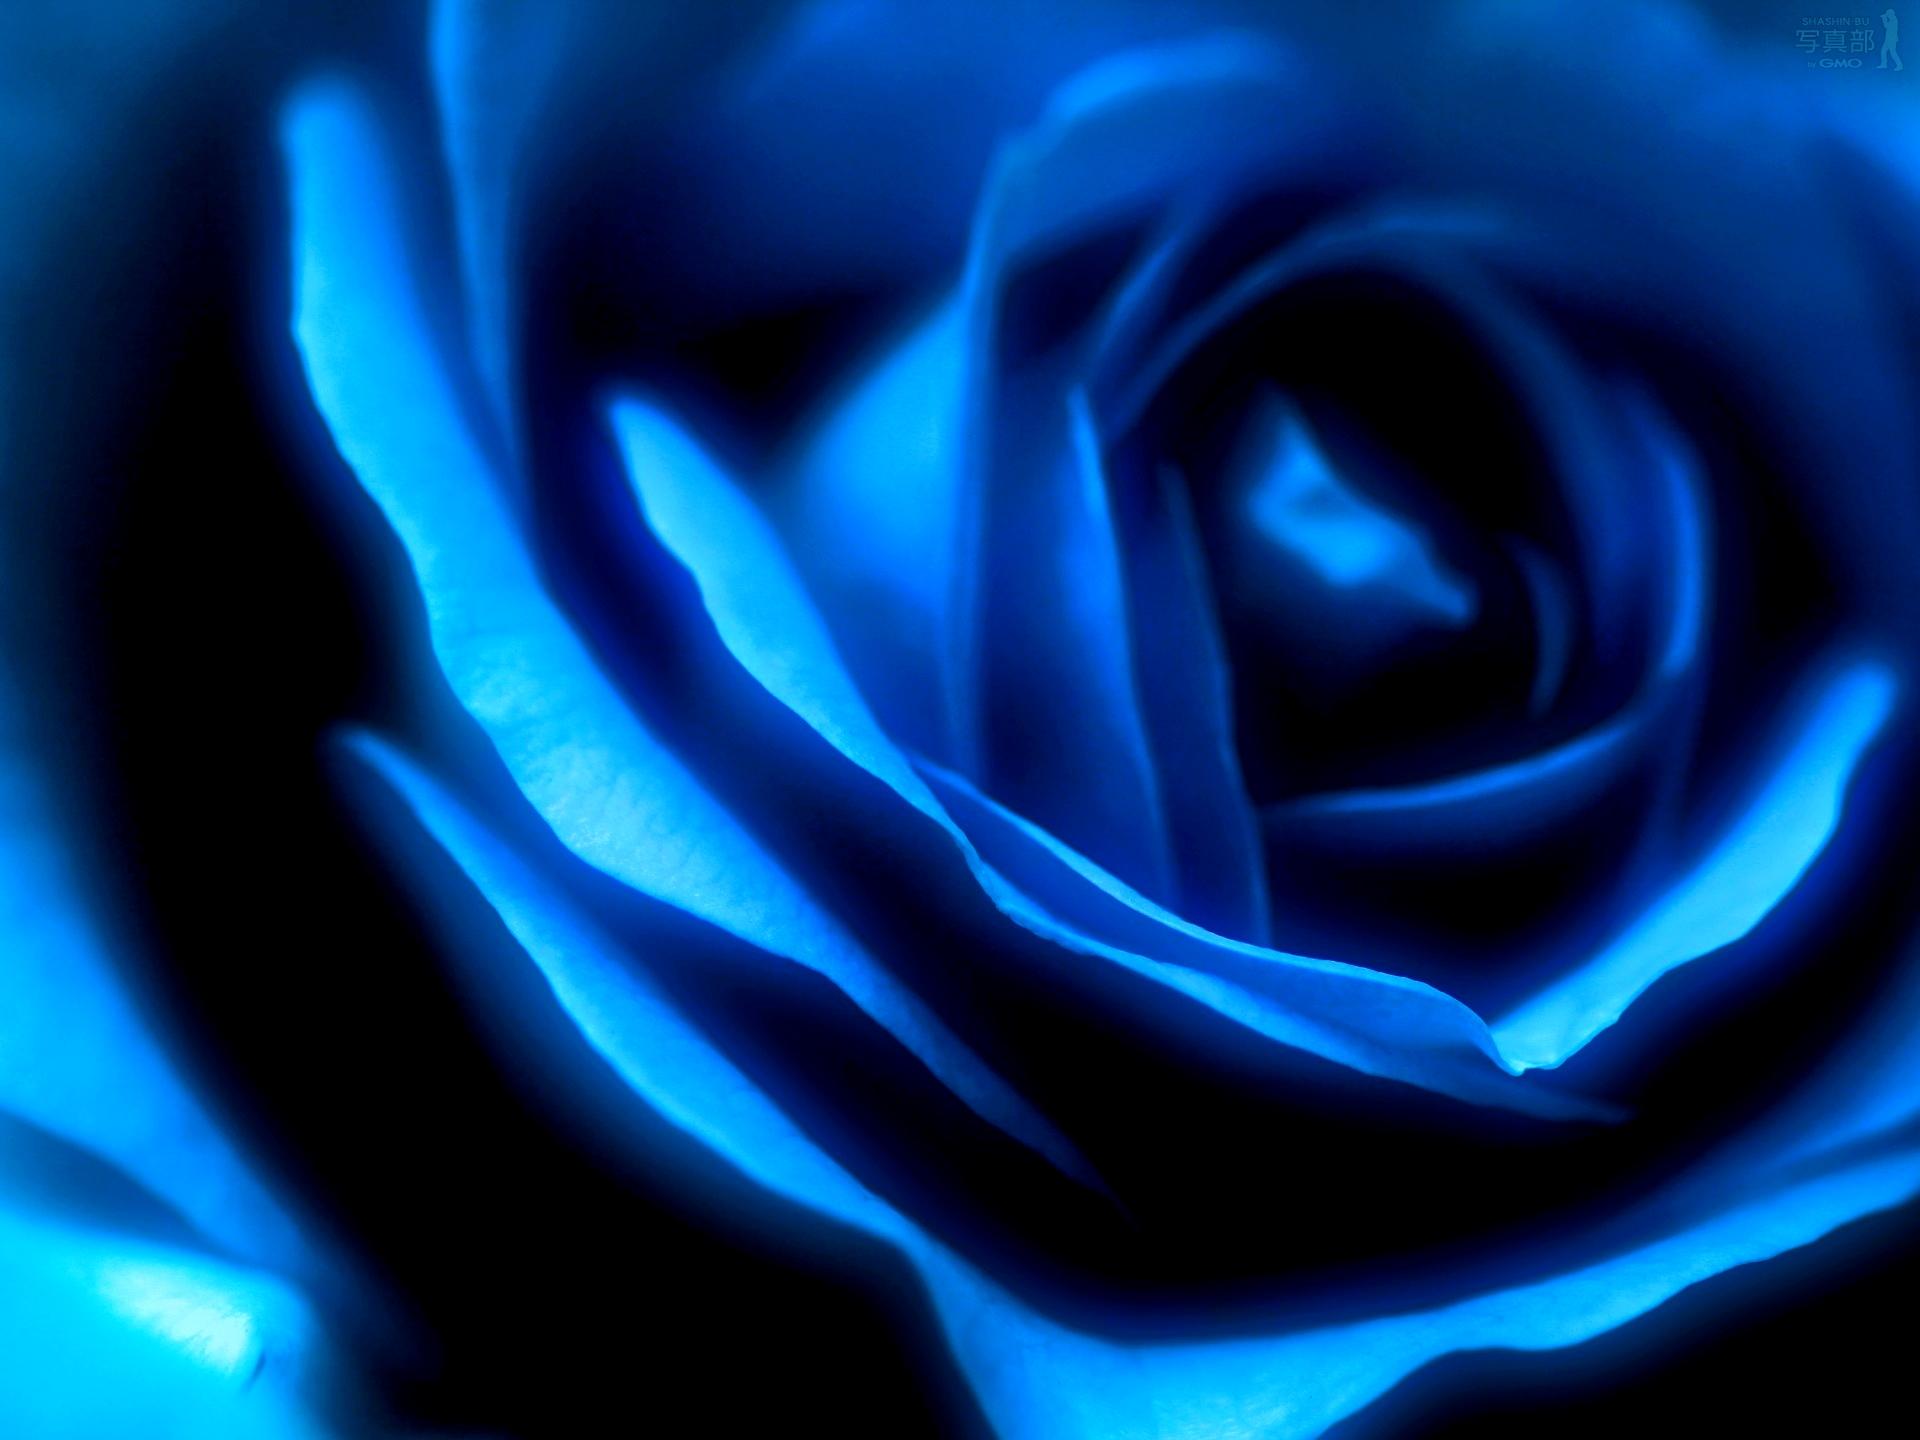 1920x1440px free blue rose wallpaper - wallpapersafari